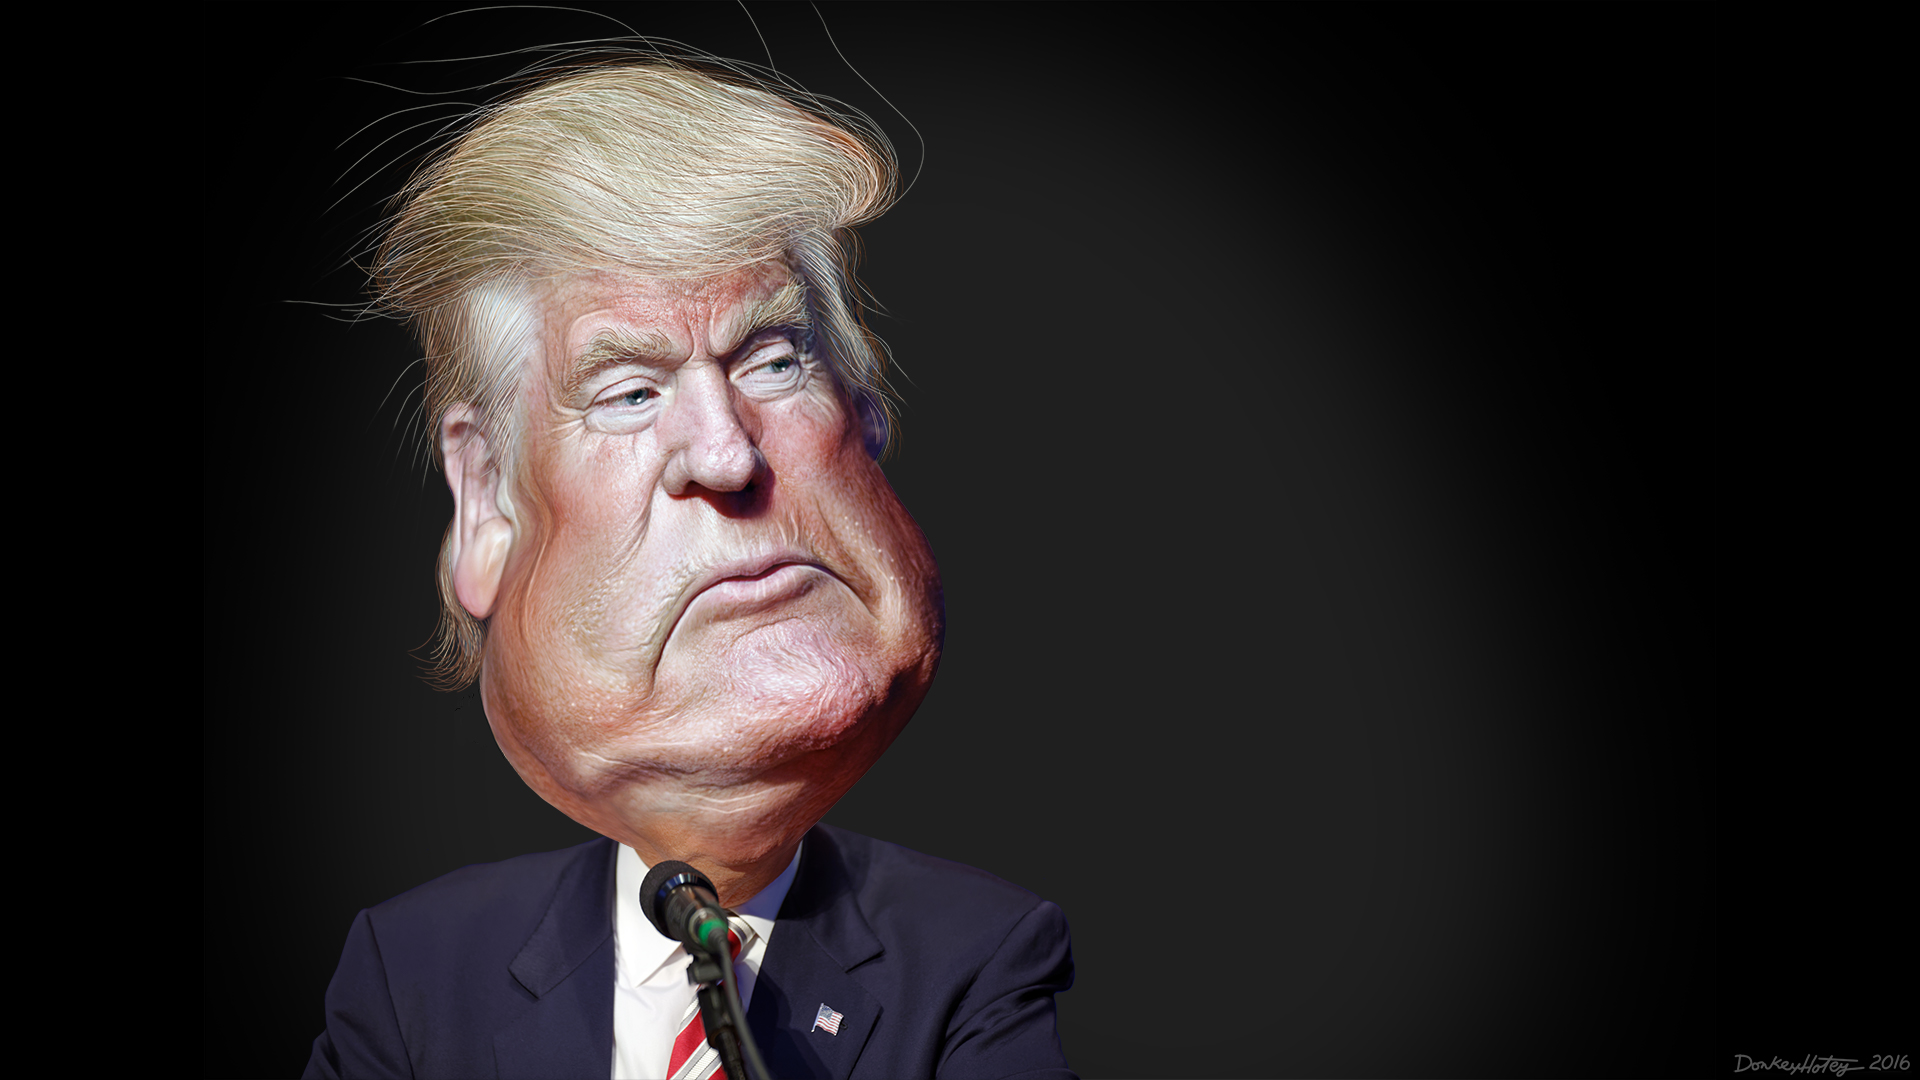 Donald Trump Caricature | by DonkeyHotey